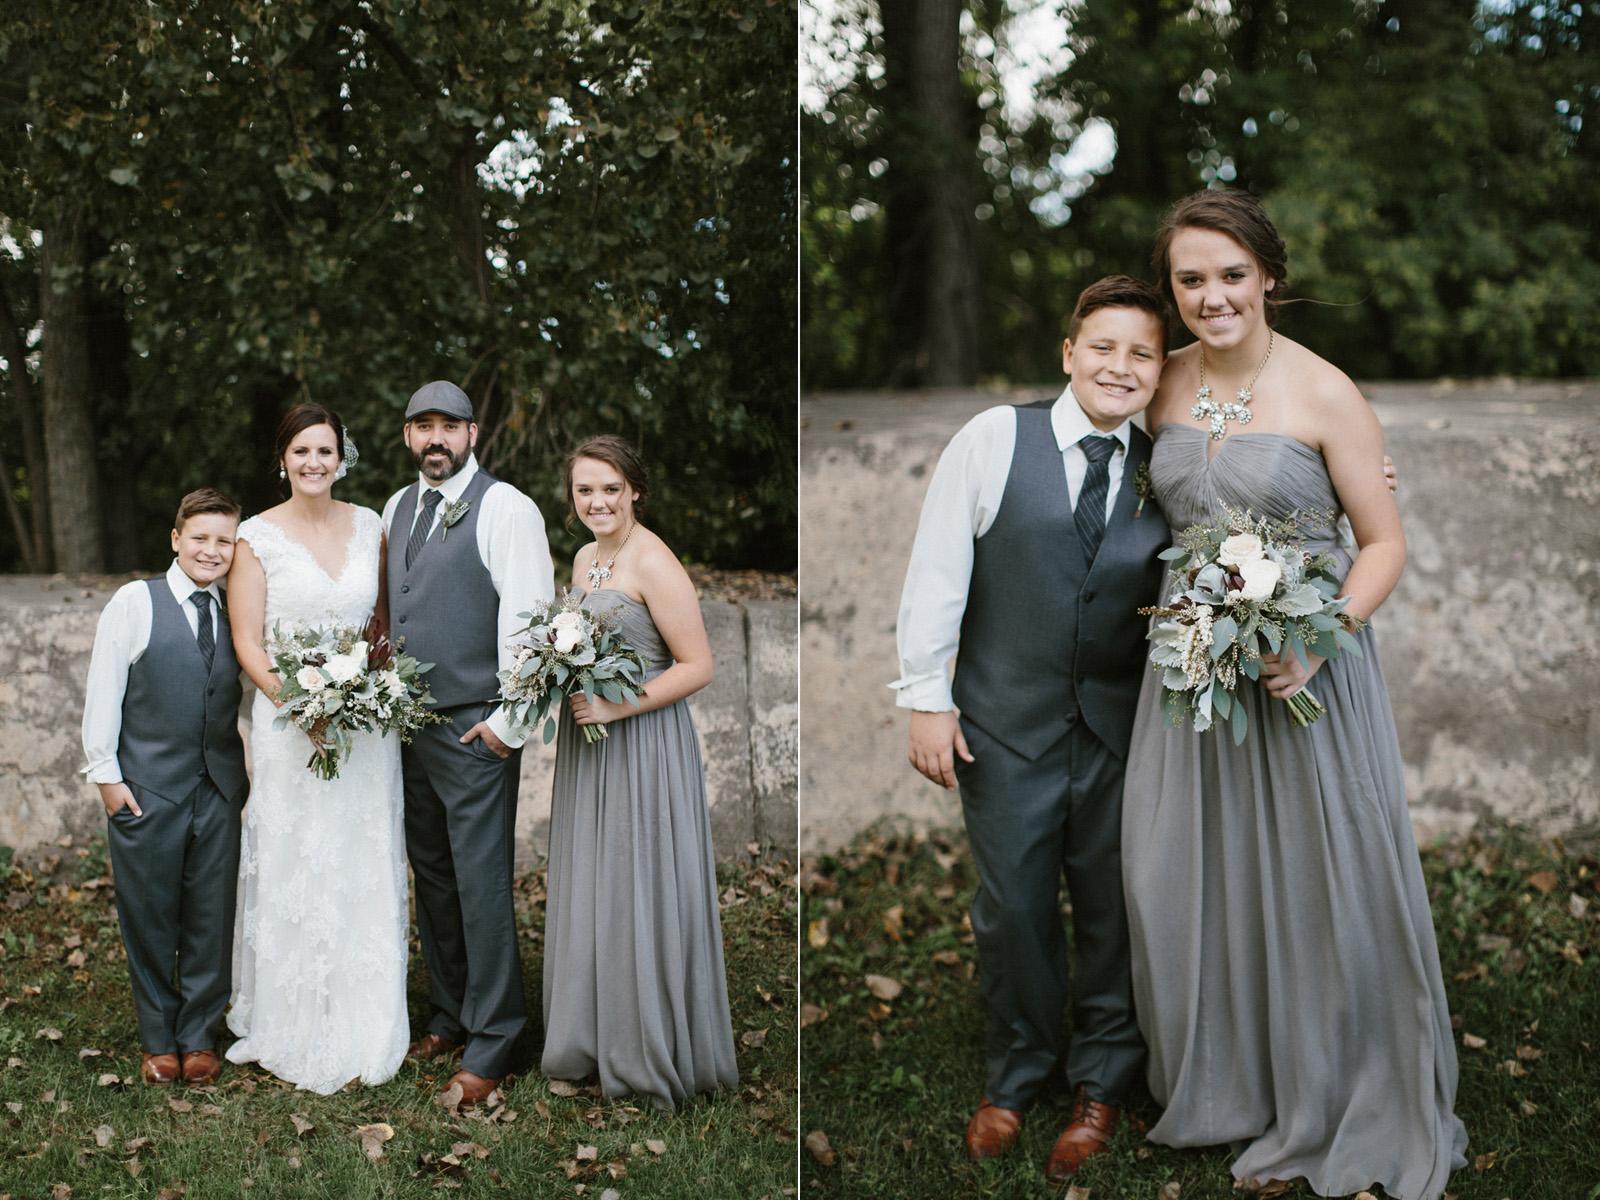 sioux_falls_desmoines_wedding_photographer_21.jpg